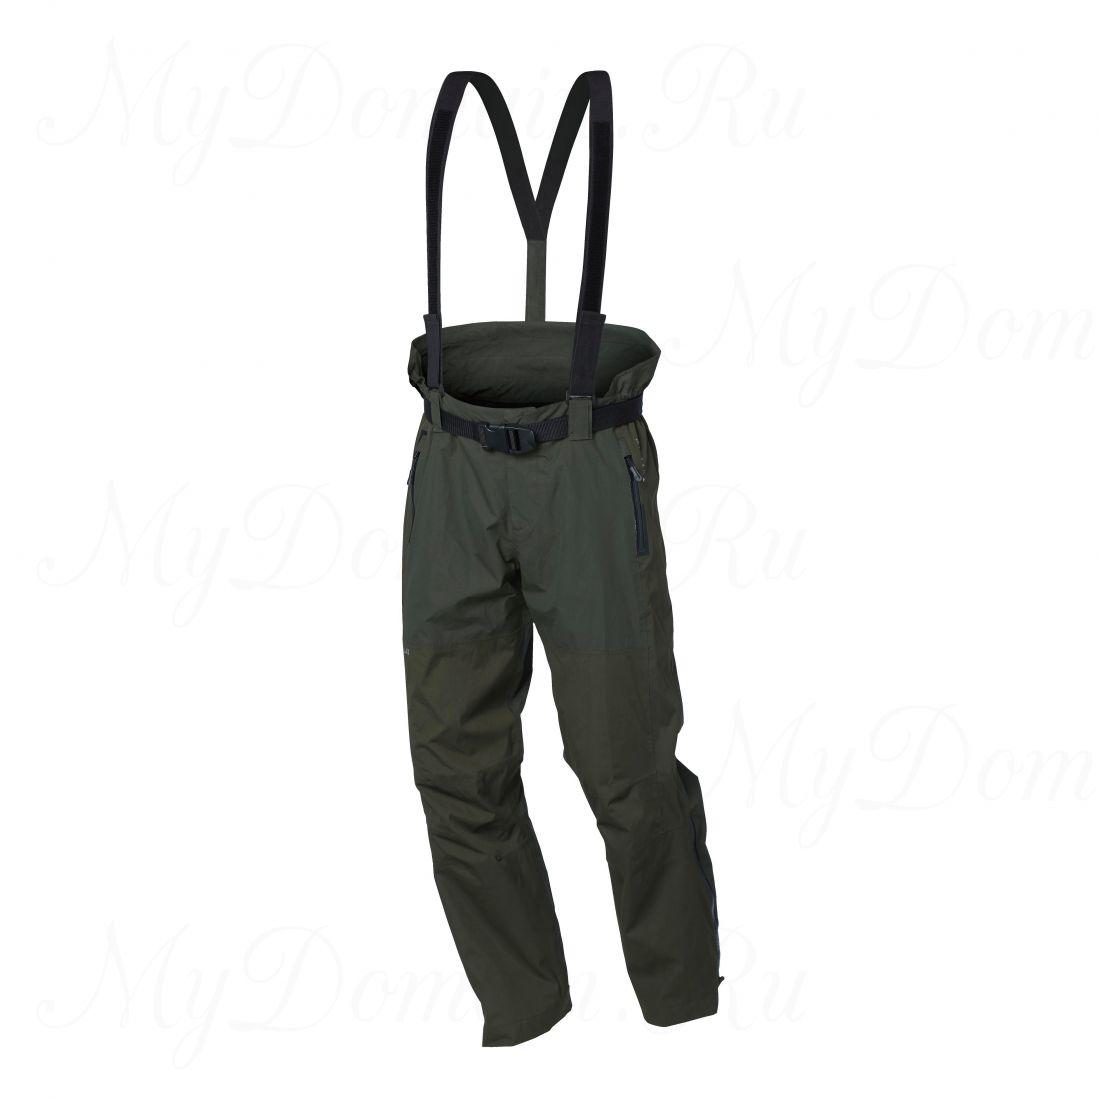 Брюки Westin W4 2-Layer Pant размер Black Iron размер XXL